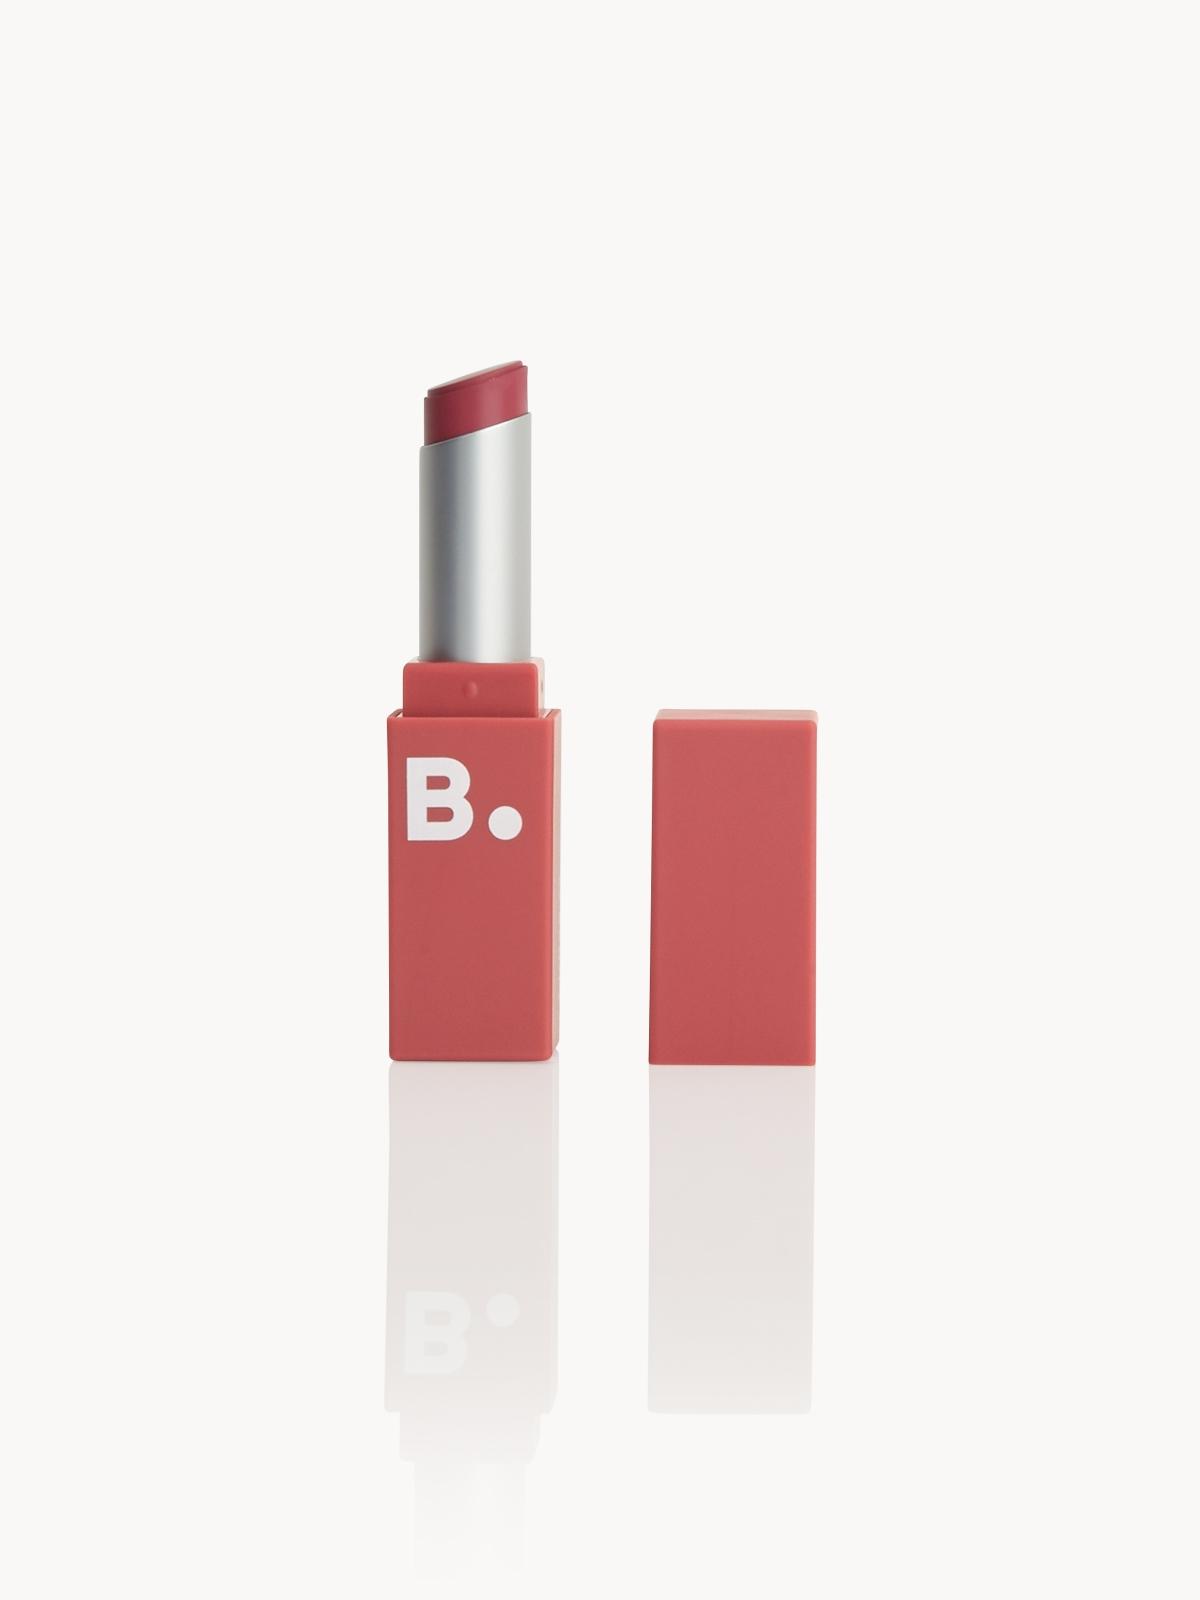 B by BANILA Lipdraw Matte Blast Lipstick So Rosy